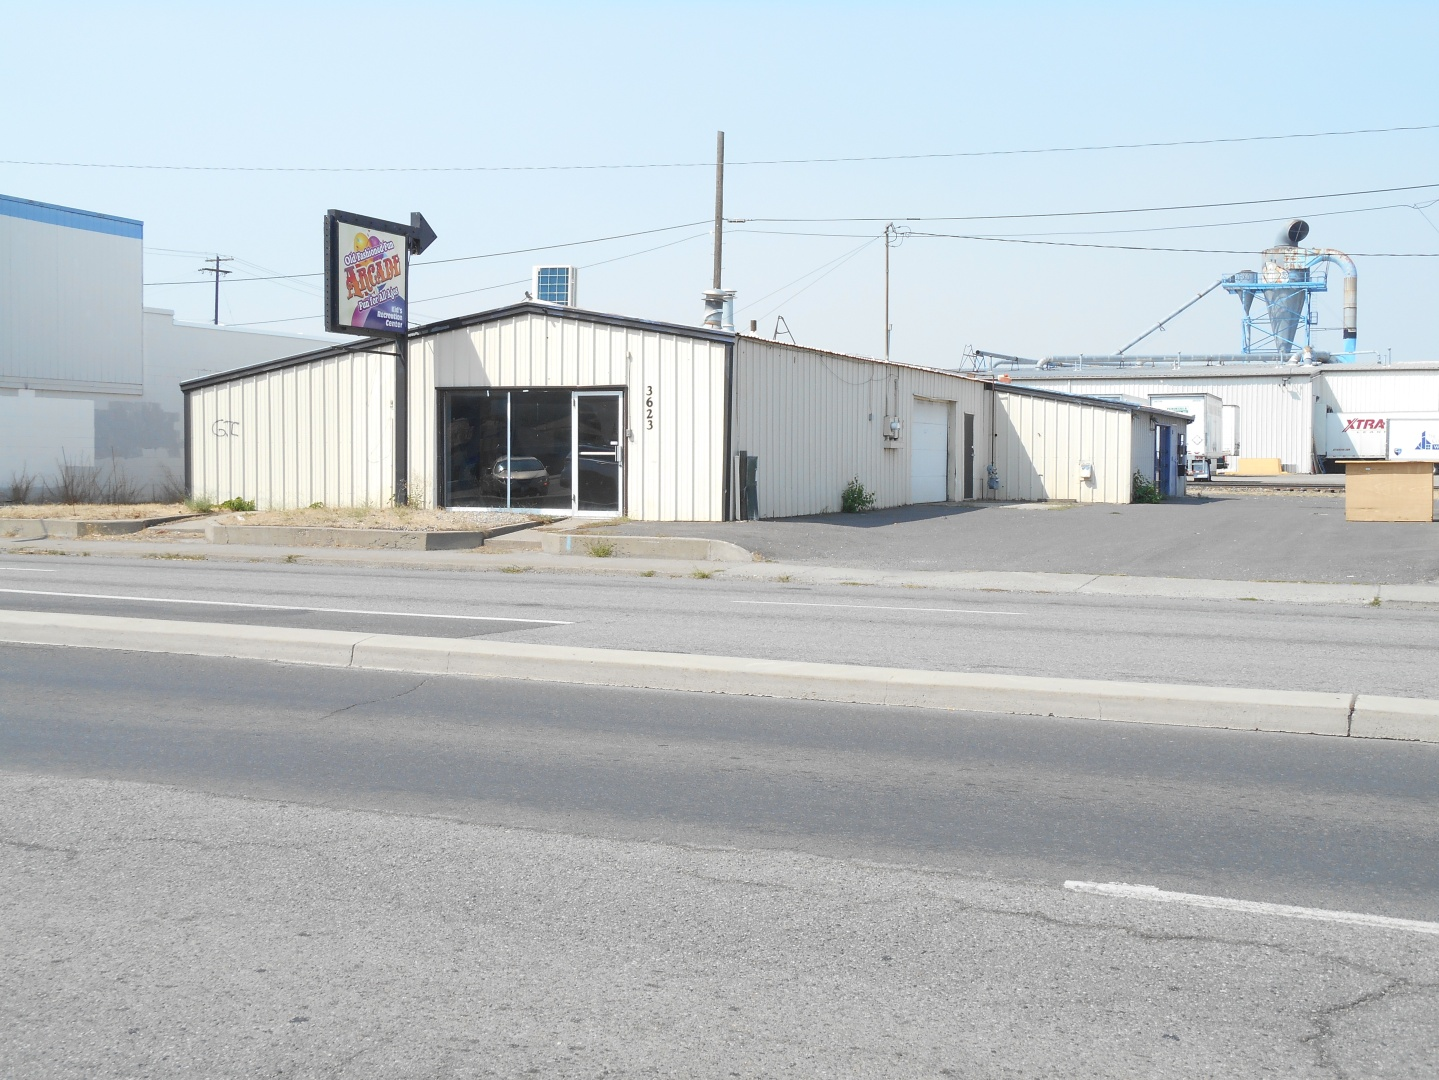 3623 E Sprague Ave Property Photo - Spokane, WA real estate listing